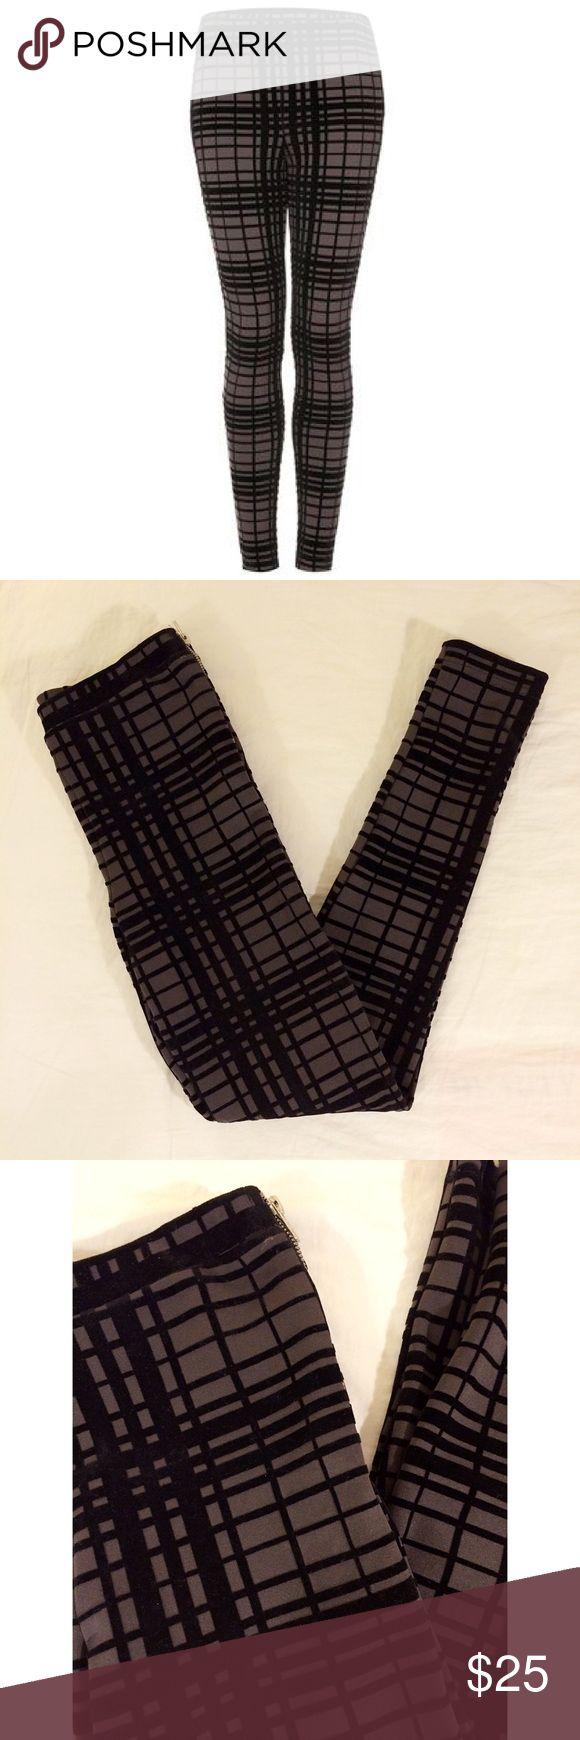 Topshop Leggings Topshop plaid checkered grid leggings size 2.  Checks are a felt texture. Good condition Topshop Pants Leggings